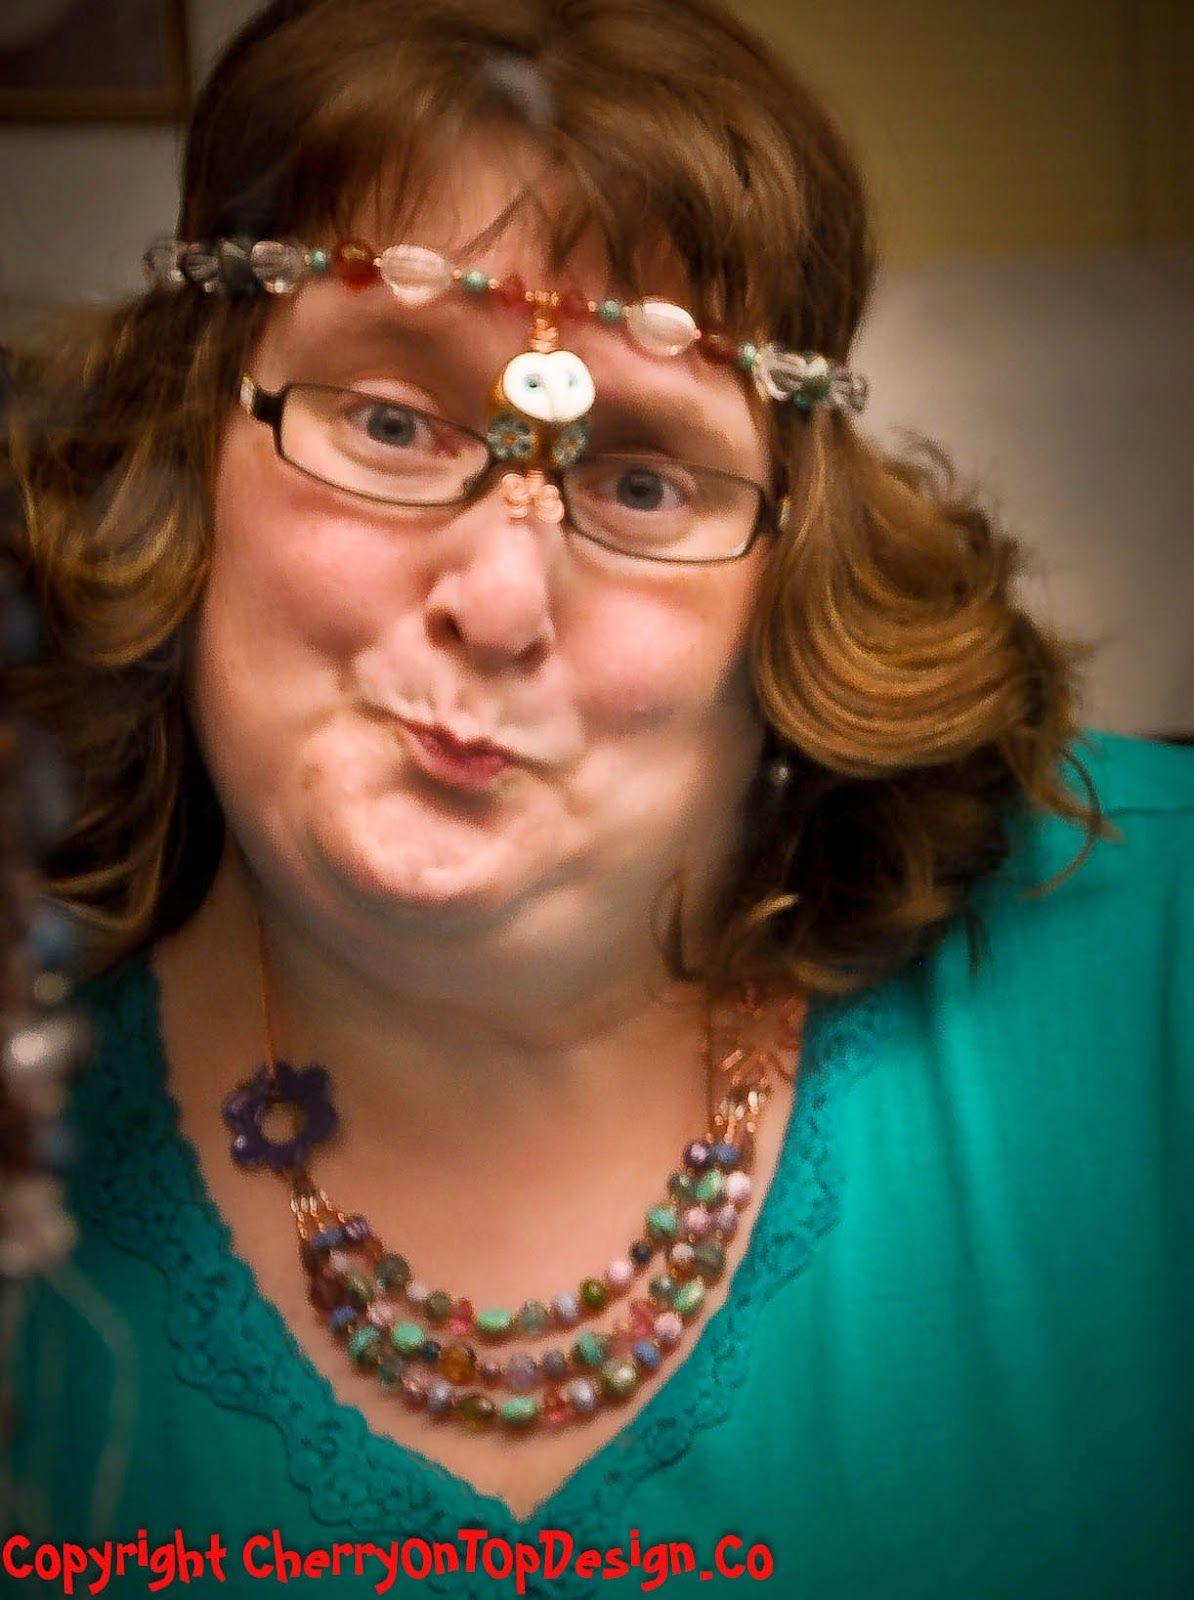 A gorgeous selfie featuring my BeadSoup jewelry -   http://fromTheBeadBoard.blogspot.com http://cherryOnTopDesign.co